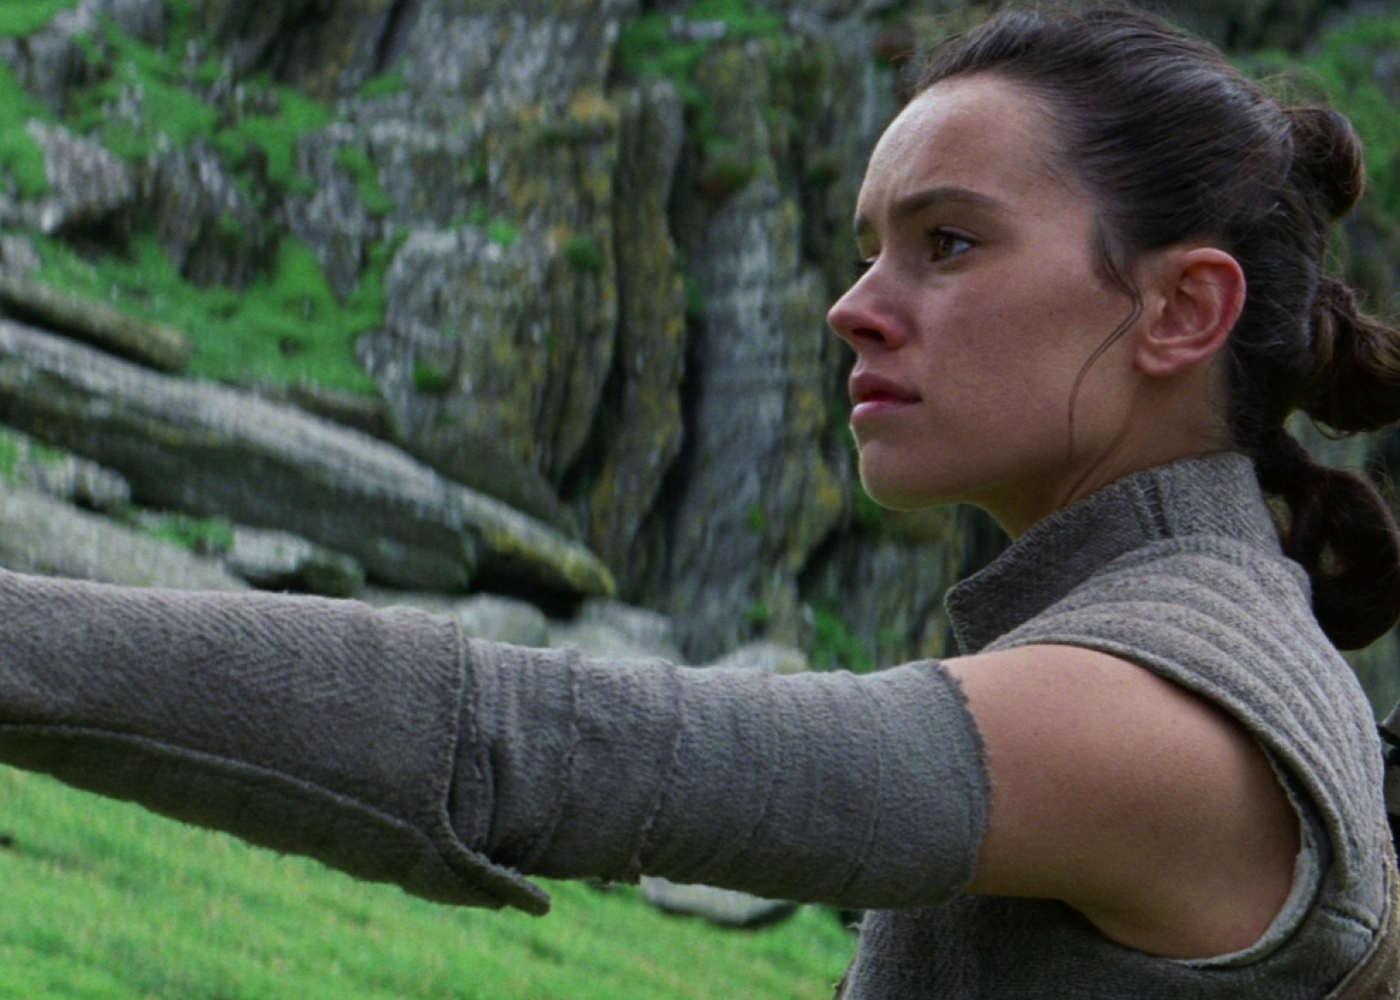 Star Wars: The Last Jedi Tickets Only Days Away